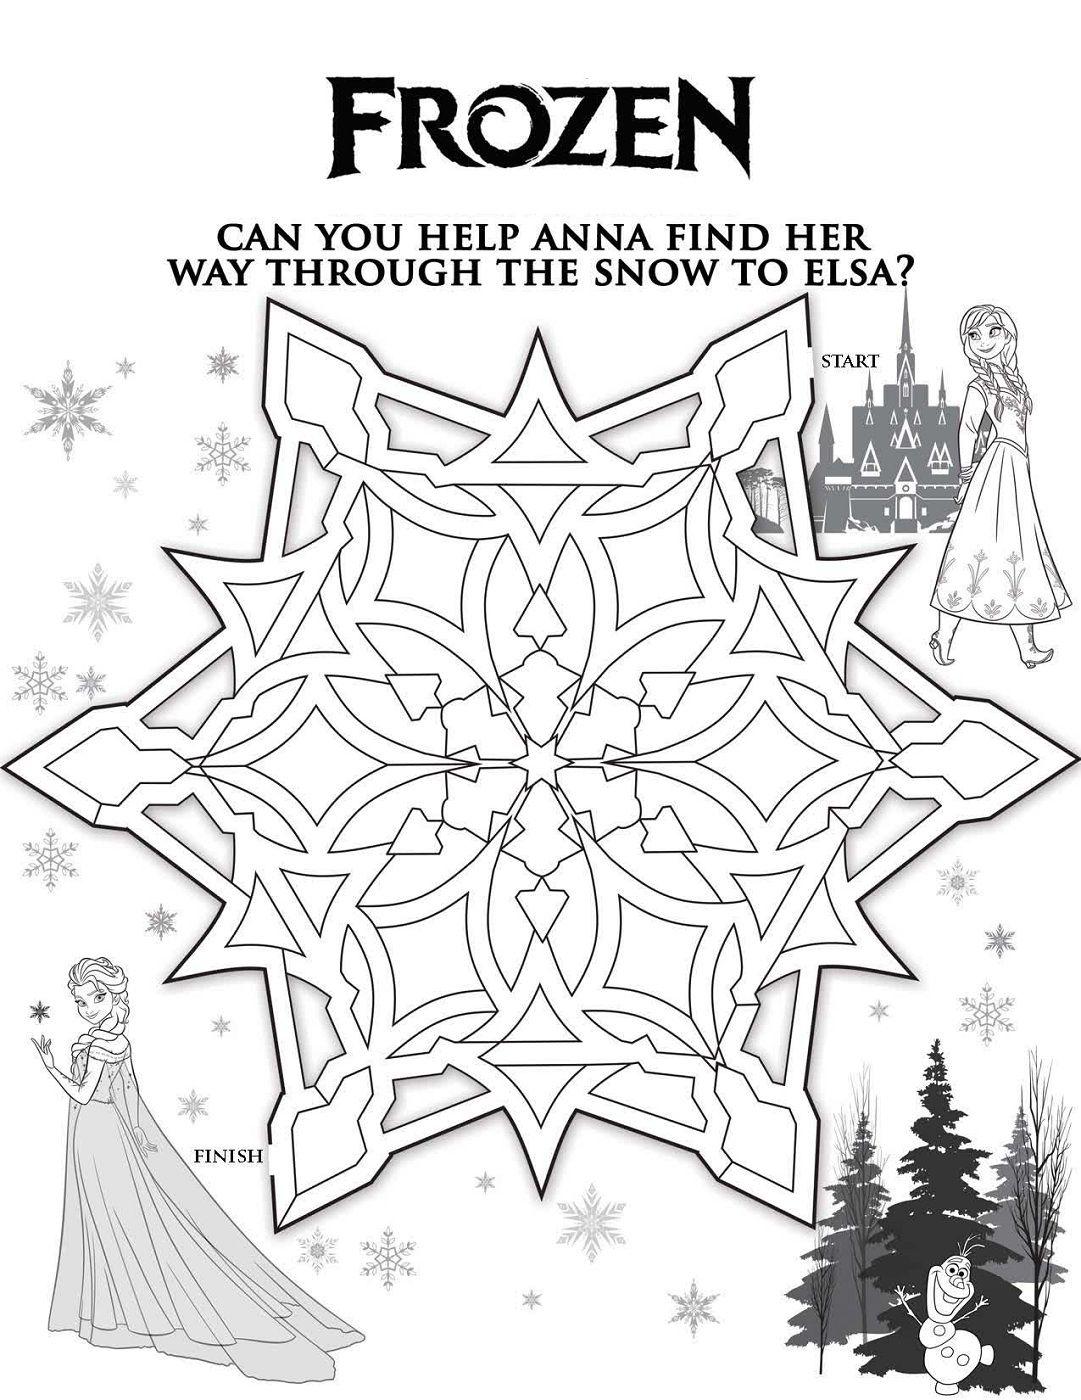 Frozen Worksheets Coloring Printable | Frozen coloring ...